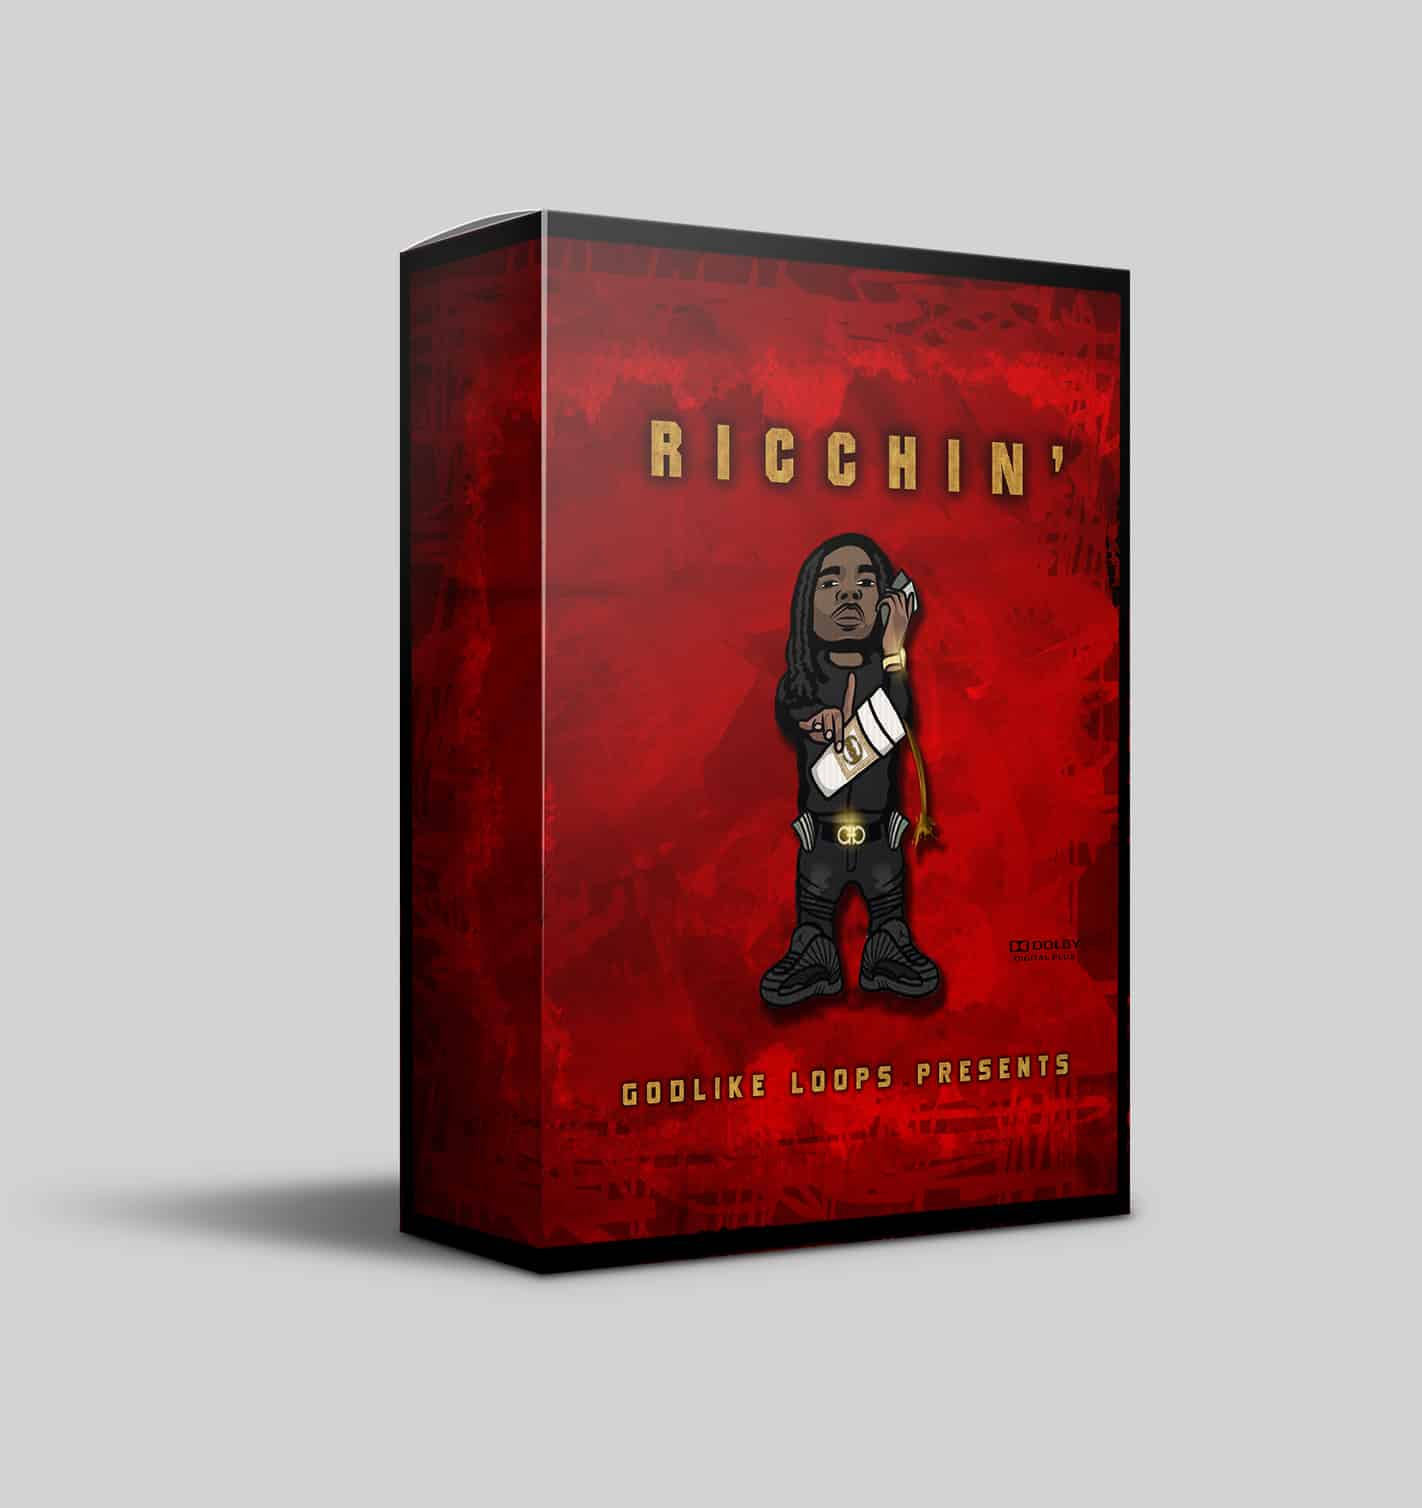 Ricchin Construction Kit by Godlilke